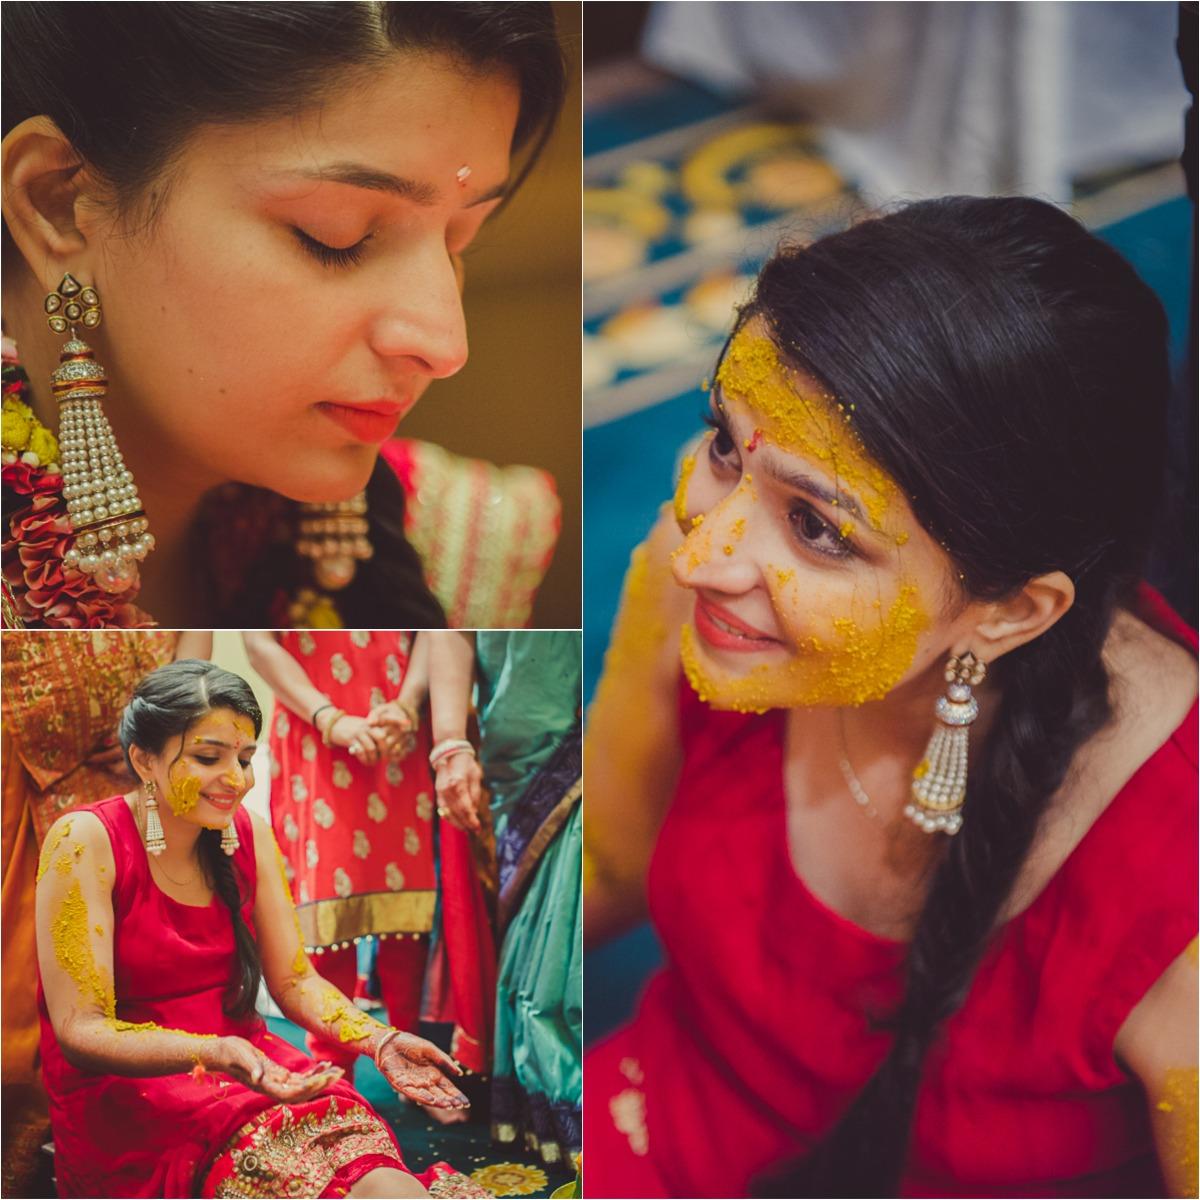 disha_rushi_thailand_wedding_030